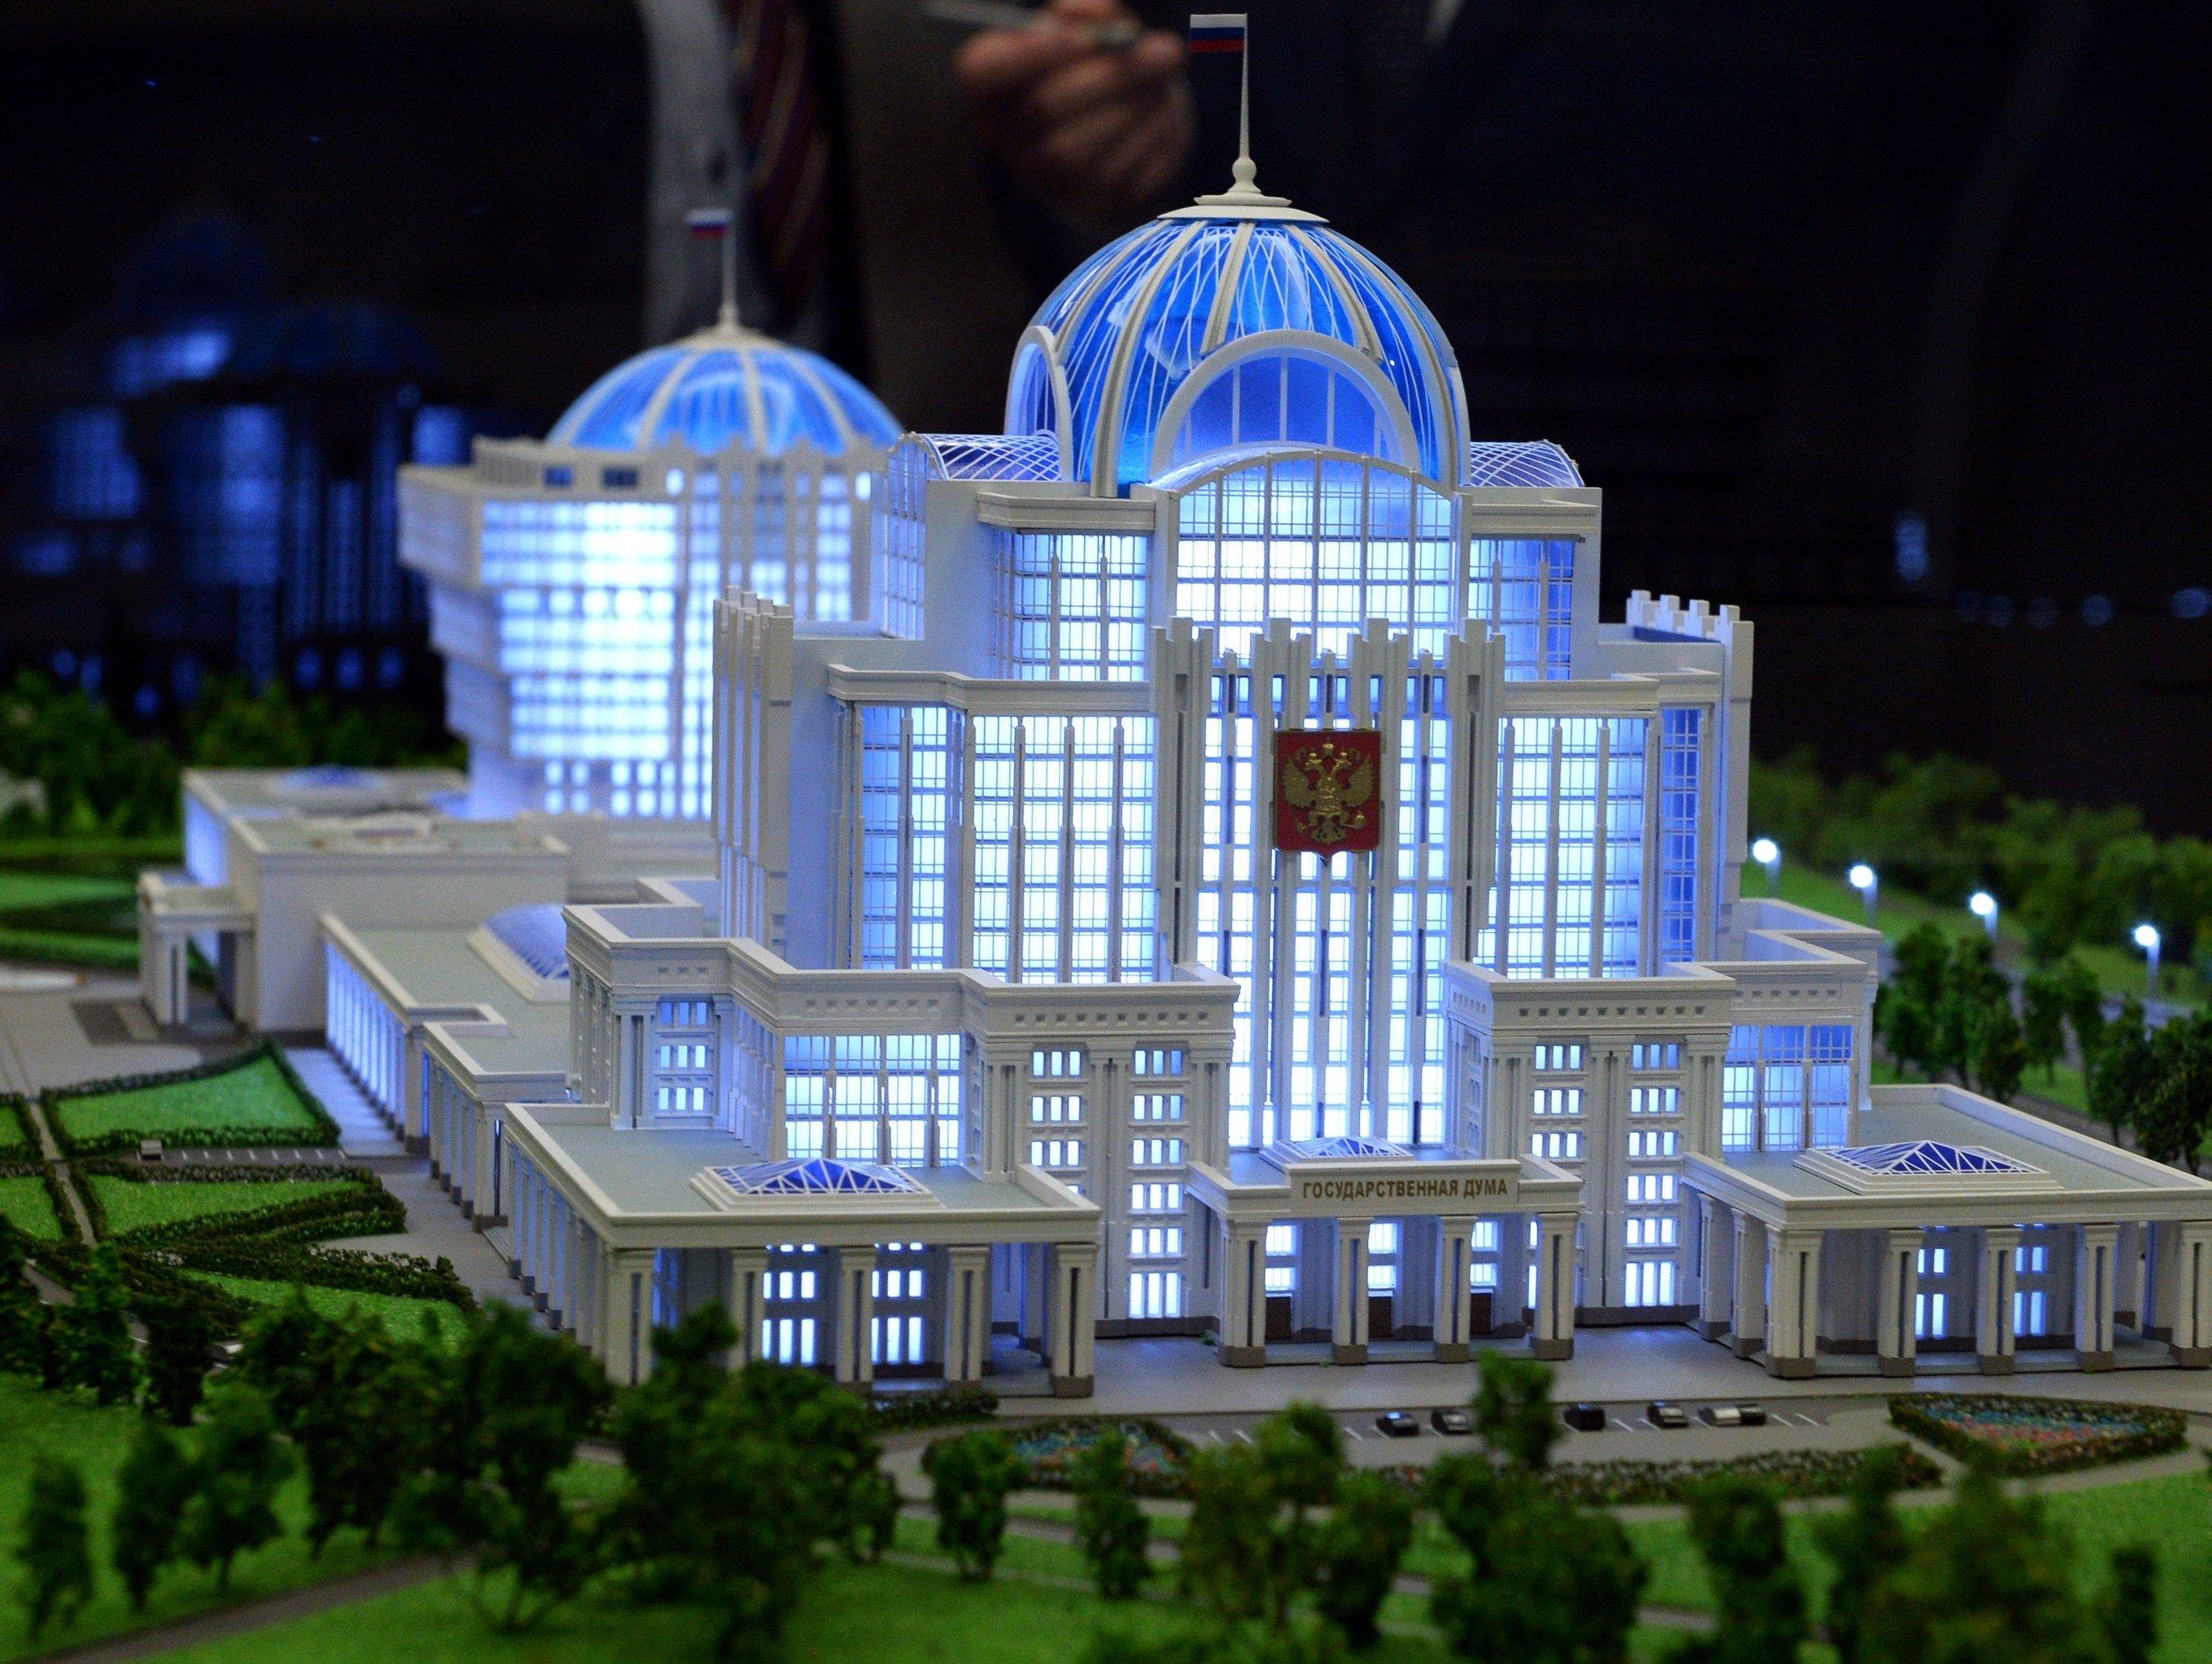 State Duma - Wikipedia